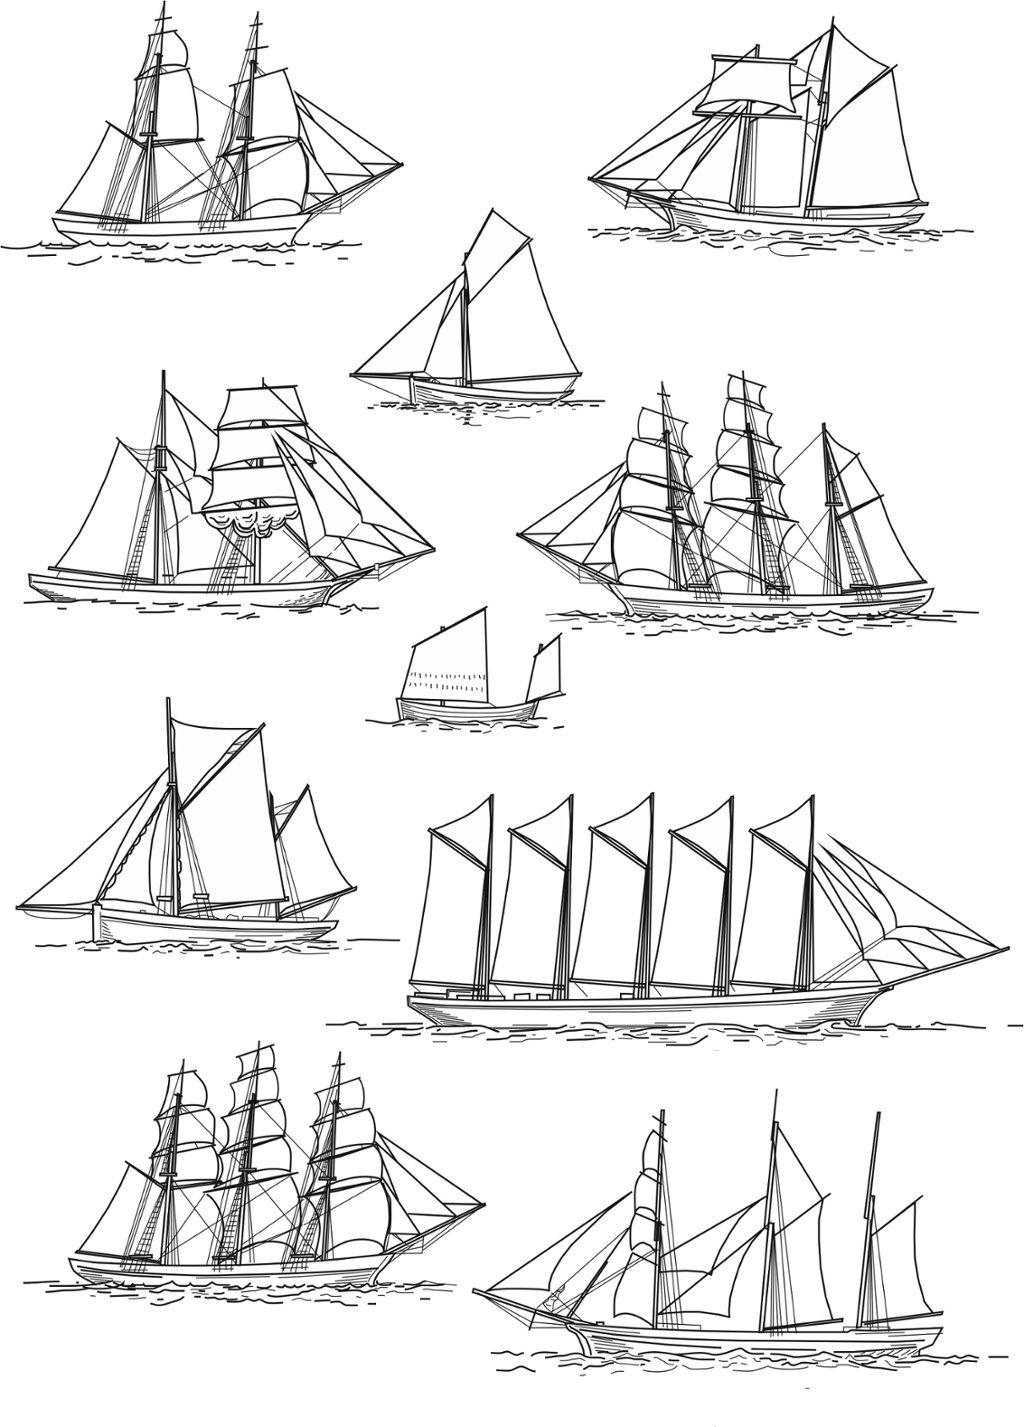 touch esta imagen  copy of  u0026quot sailing ship rig types u0026quot  by